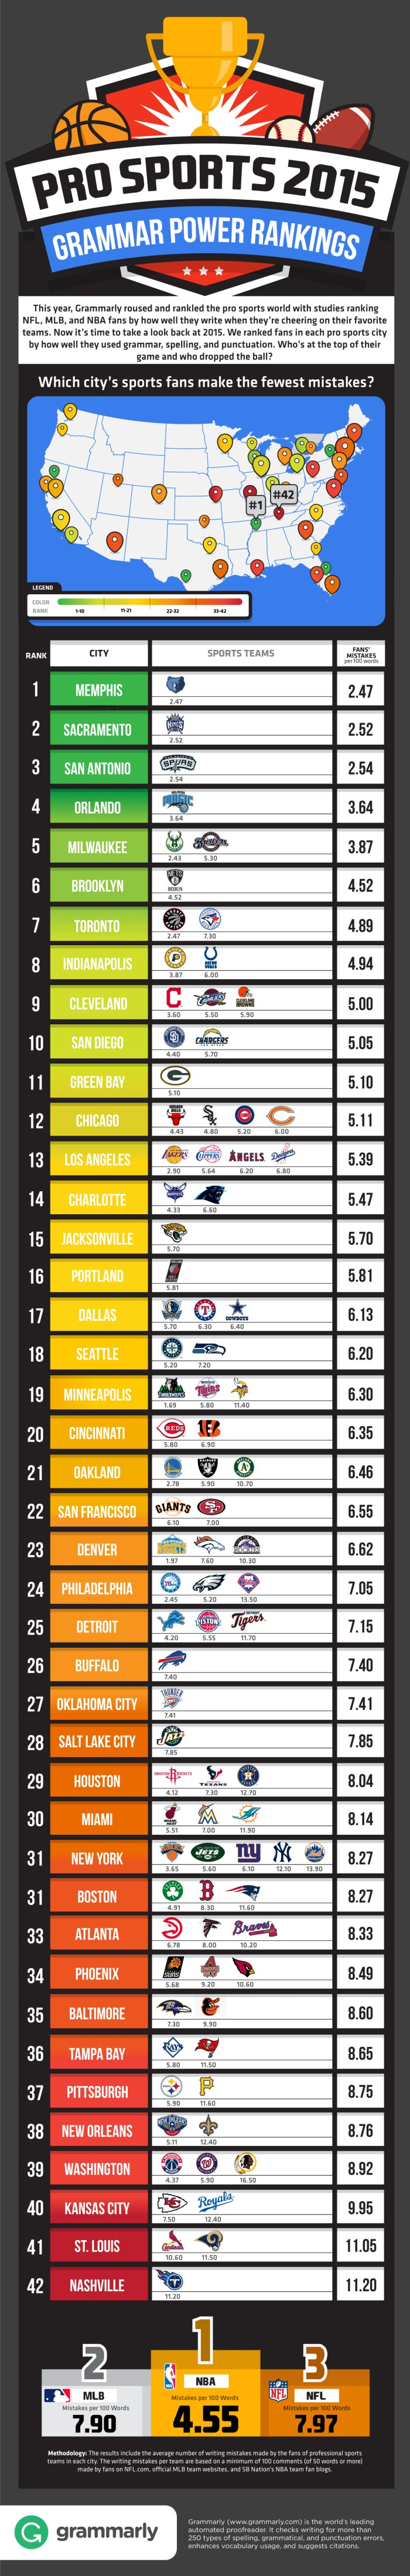 Sports Fan Cities Grammar Ranking Infographic